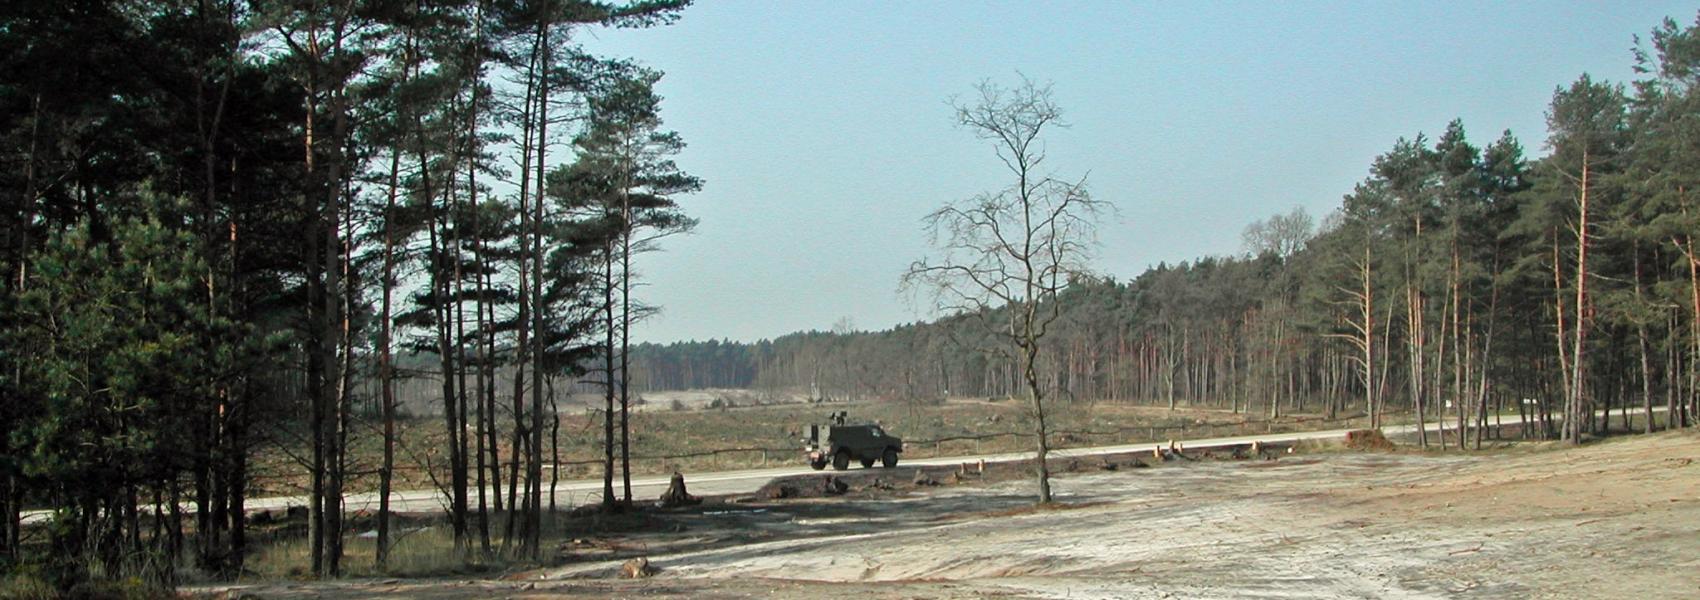 Militair domein Kamp Beverlo